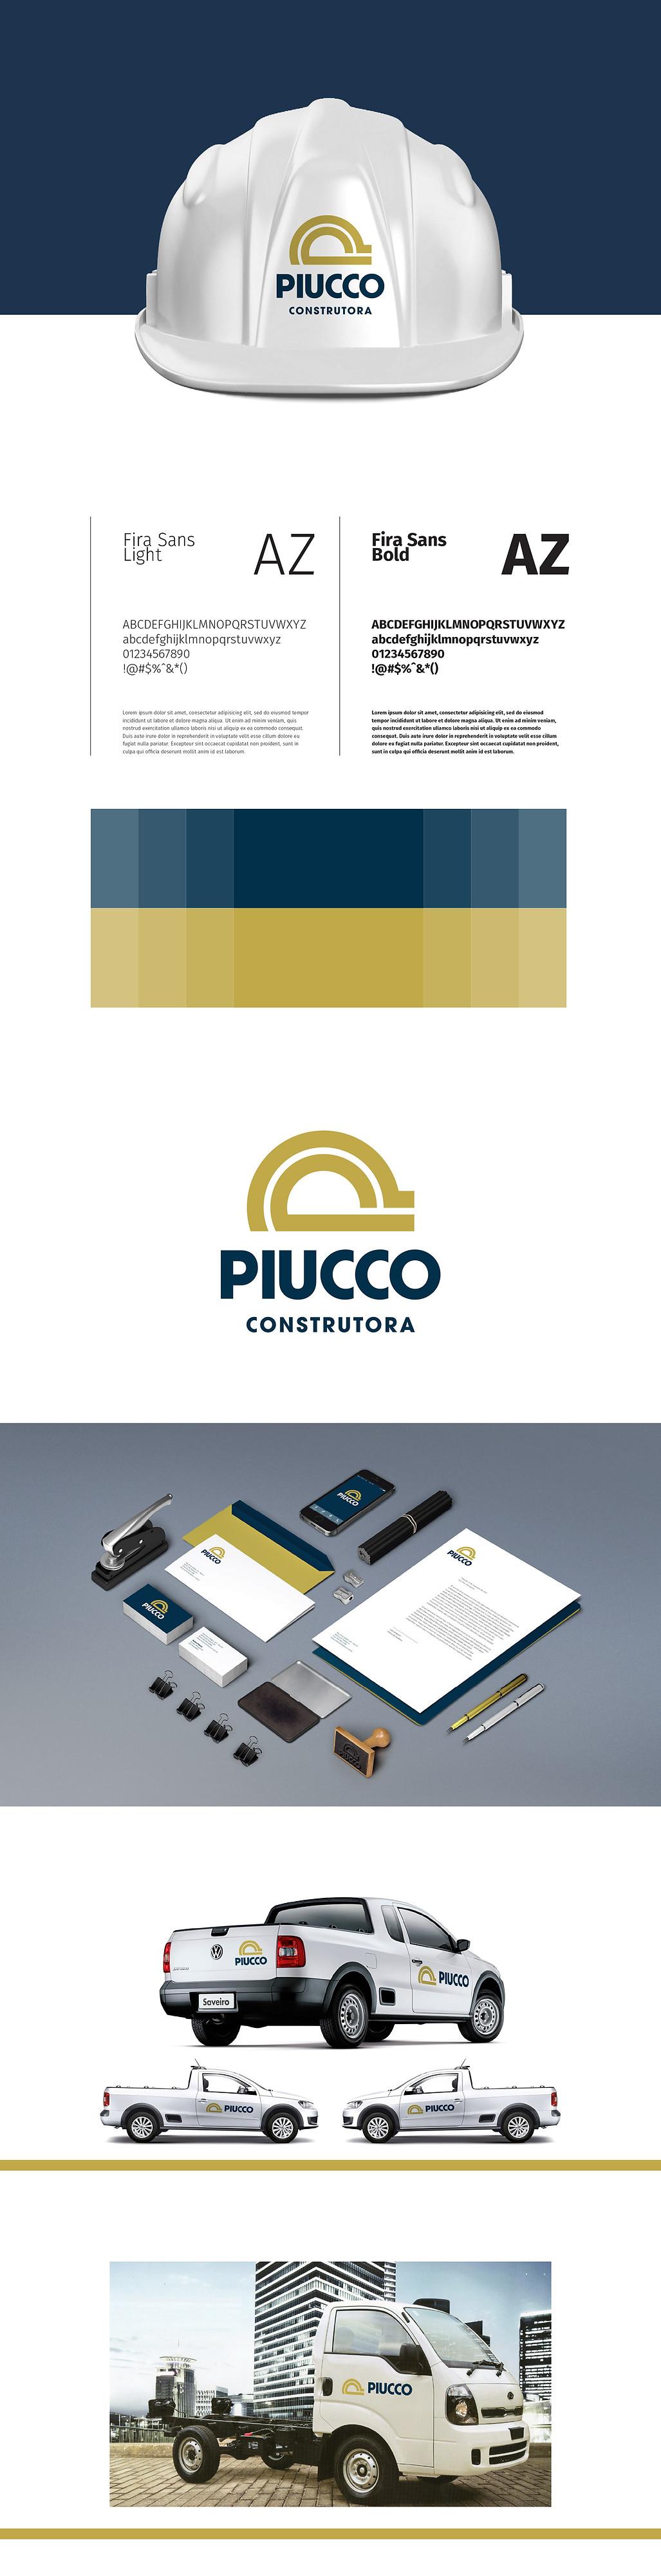 Piucco.jpg